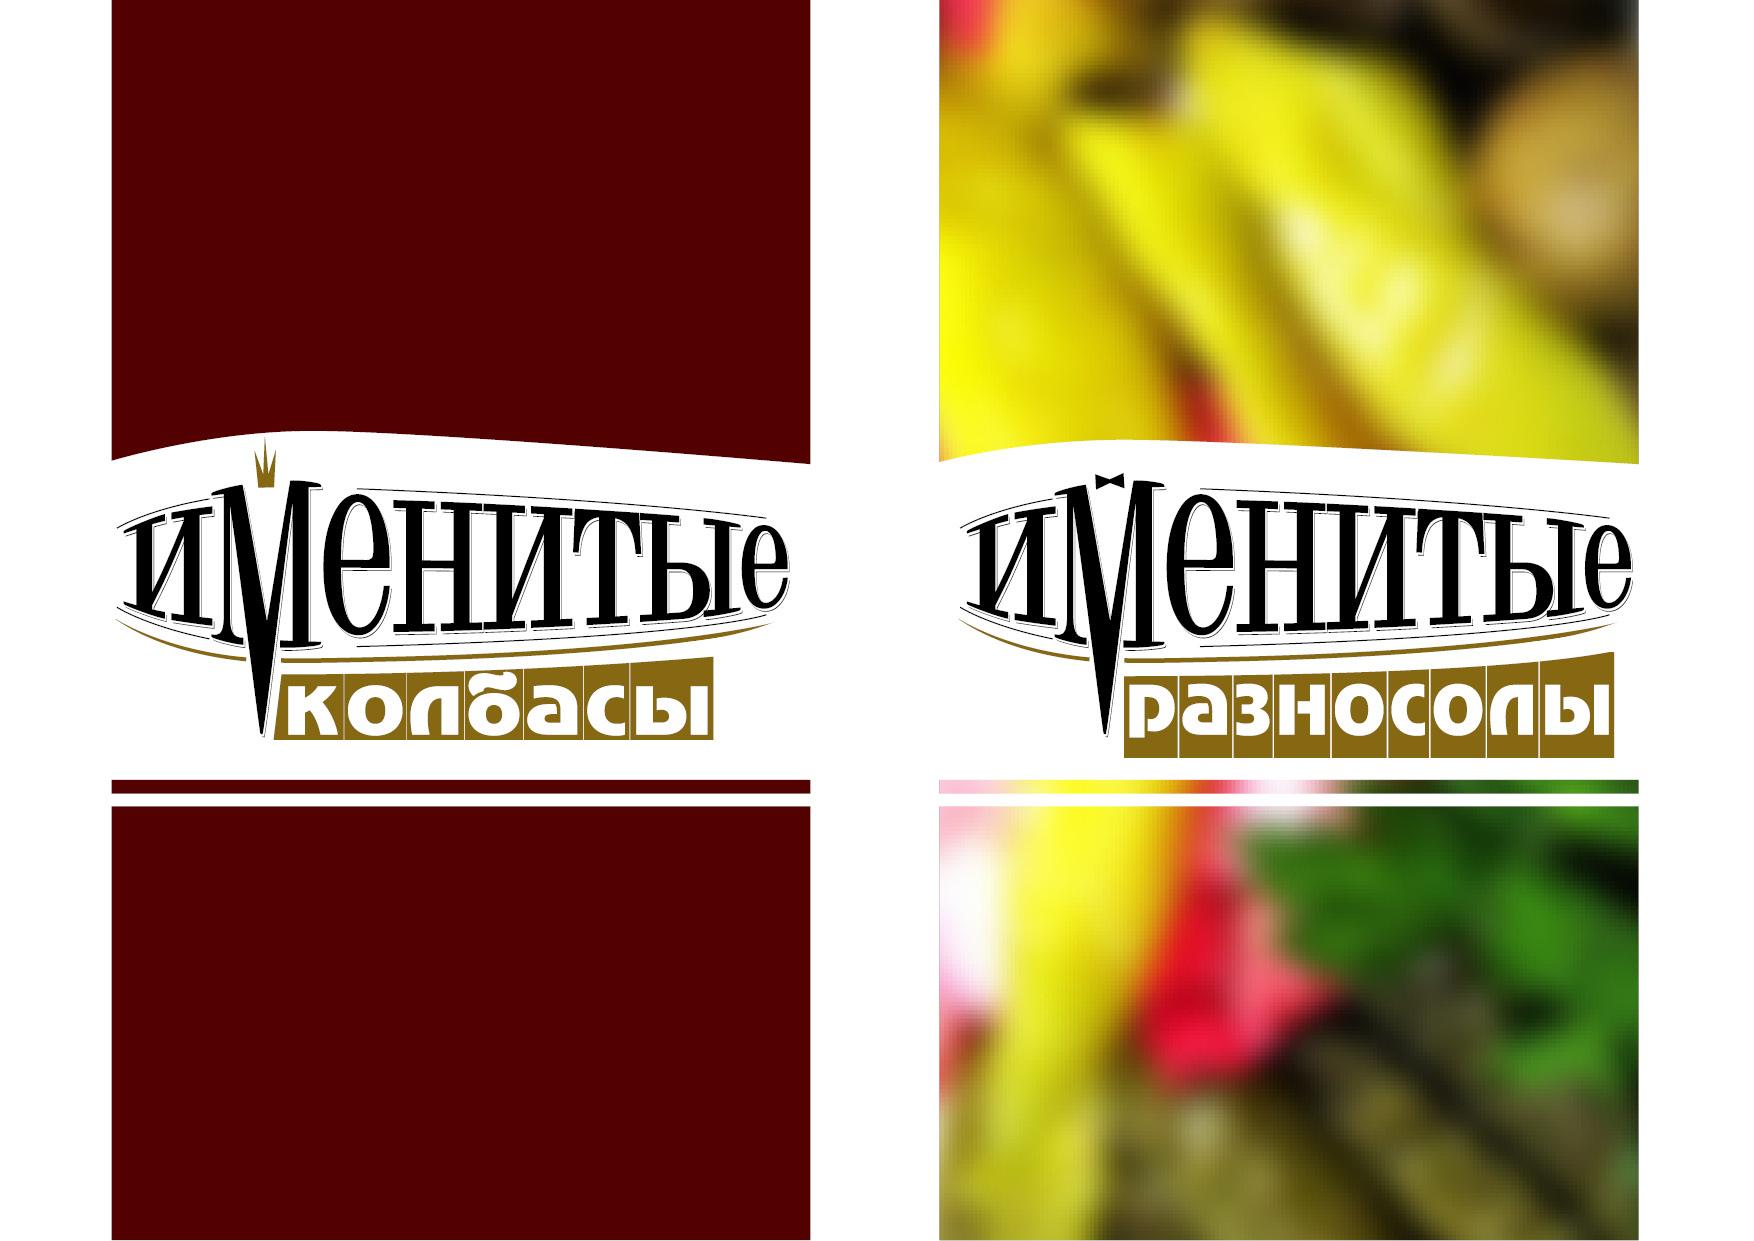 Логотип и фирменный стиль продуктов питания фото f_5165bb5509b07ebe.jpg